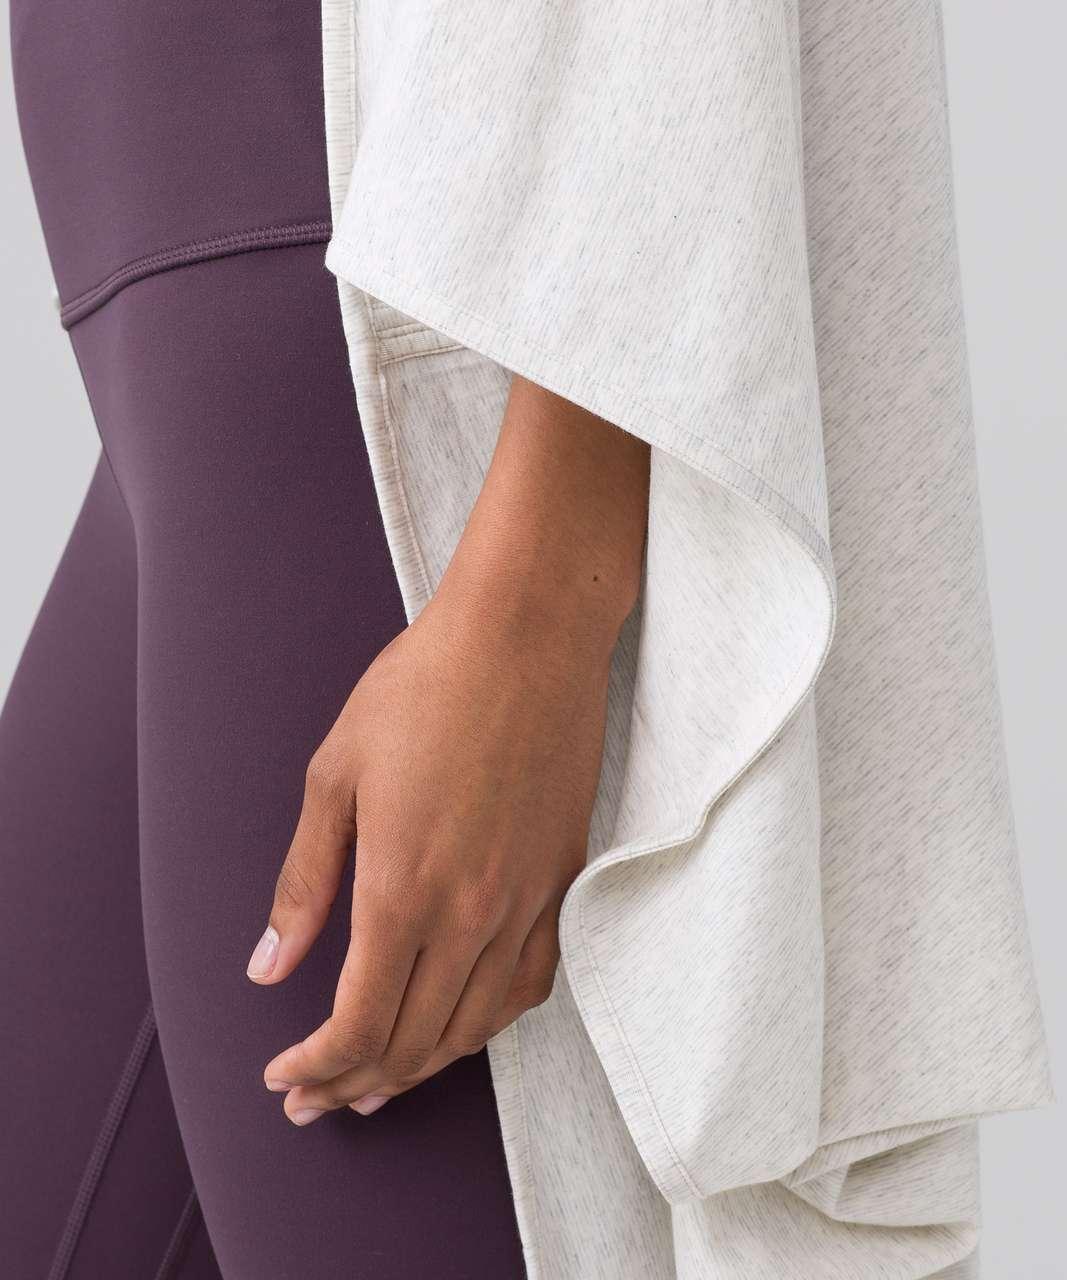 Lululemon Sage Scarf (Cotton) - Wee Stripe Heathered Light Grey White